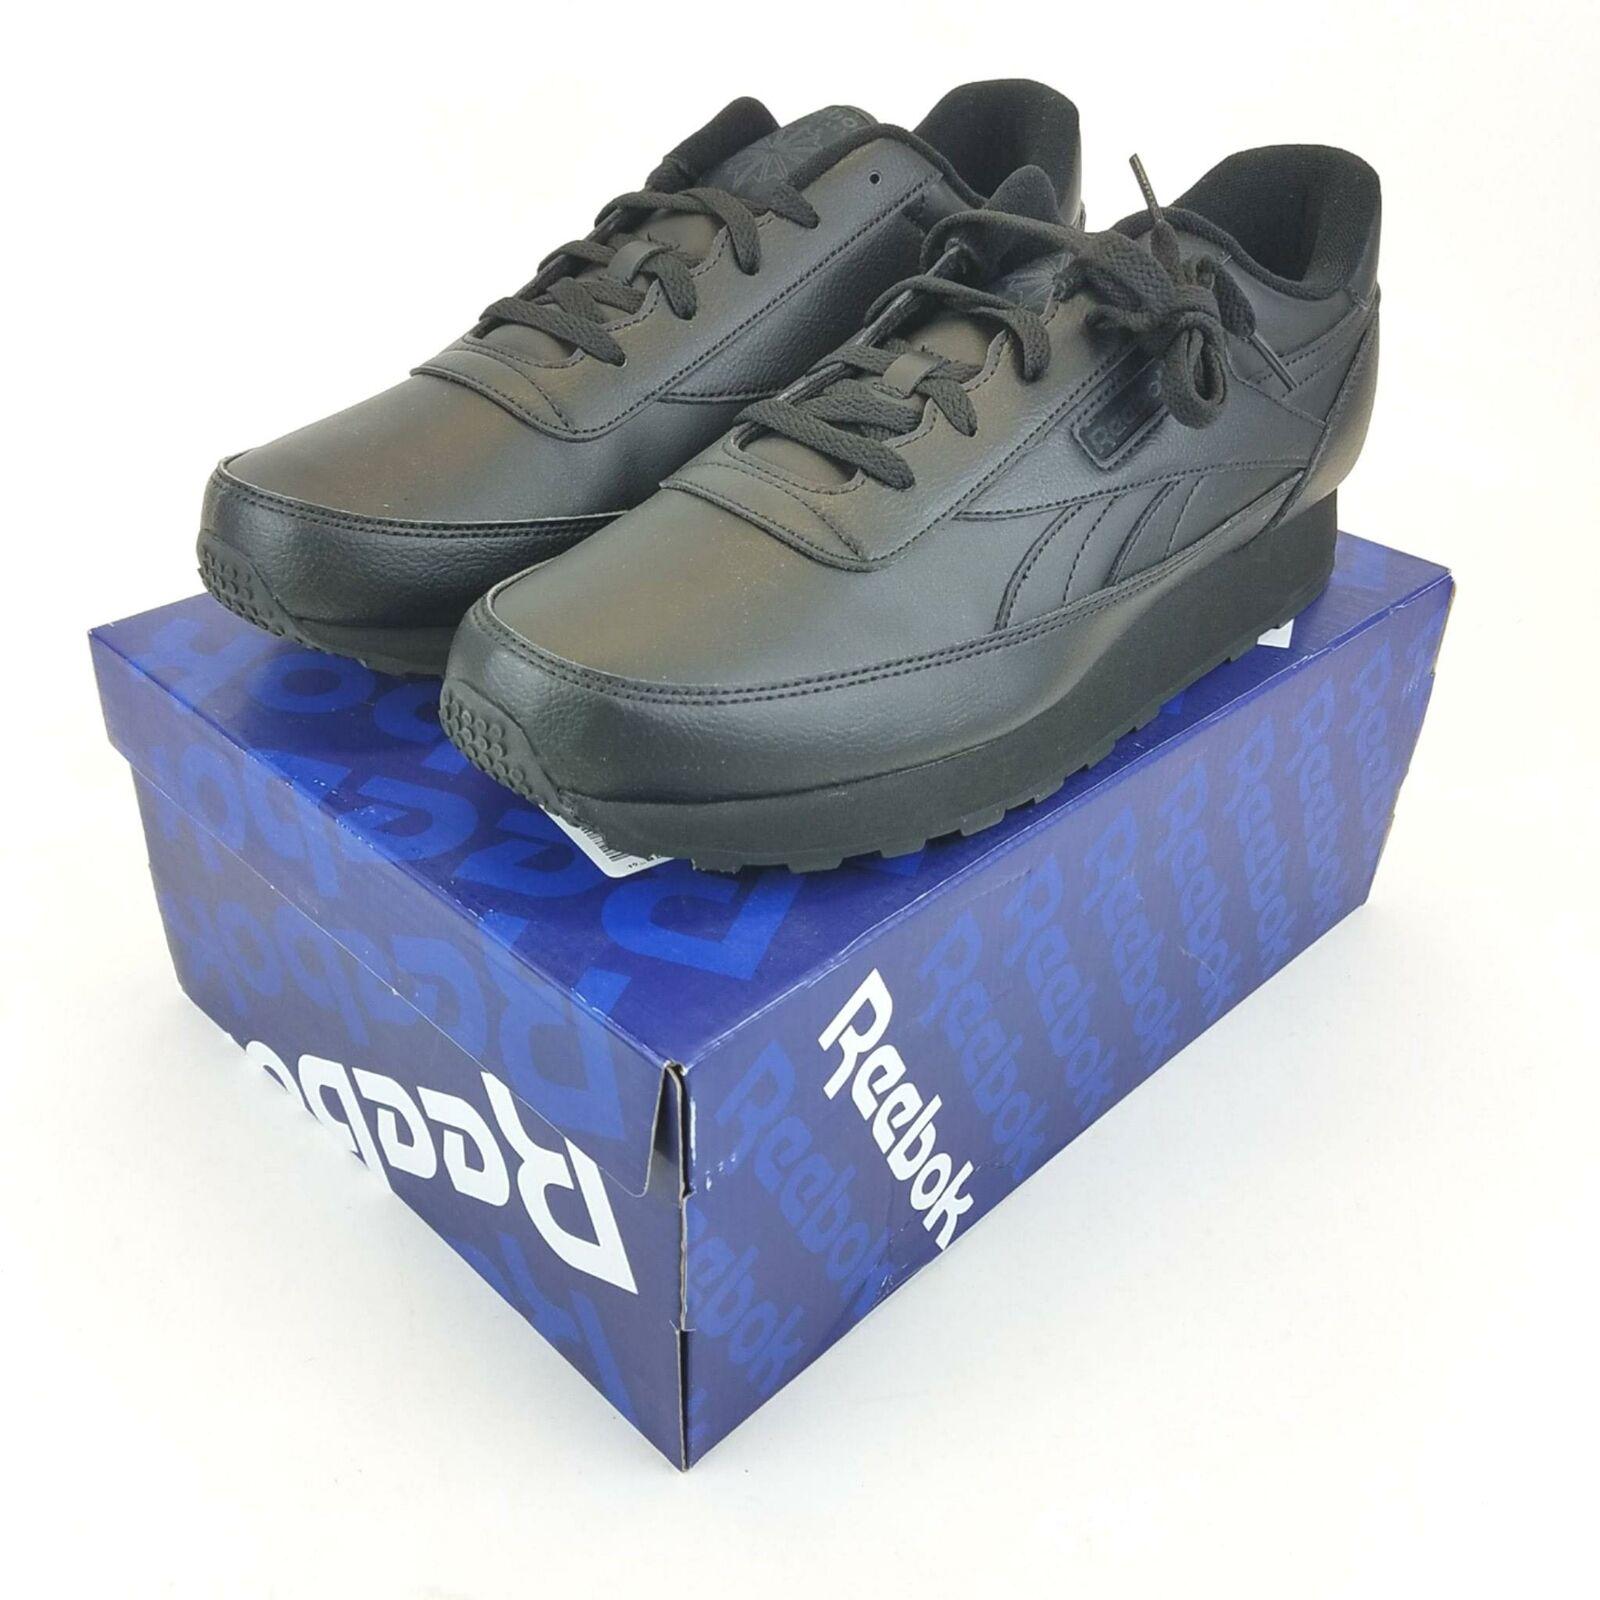 Reebok Classic Renaissance Athletic Casual Mens Shoes 12 Black Leather V66939